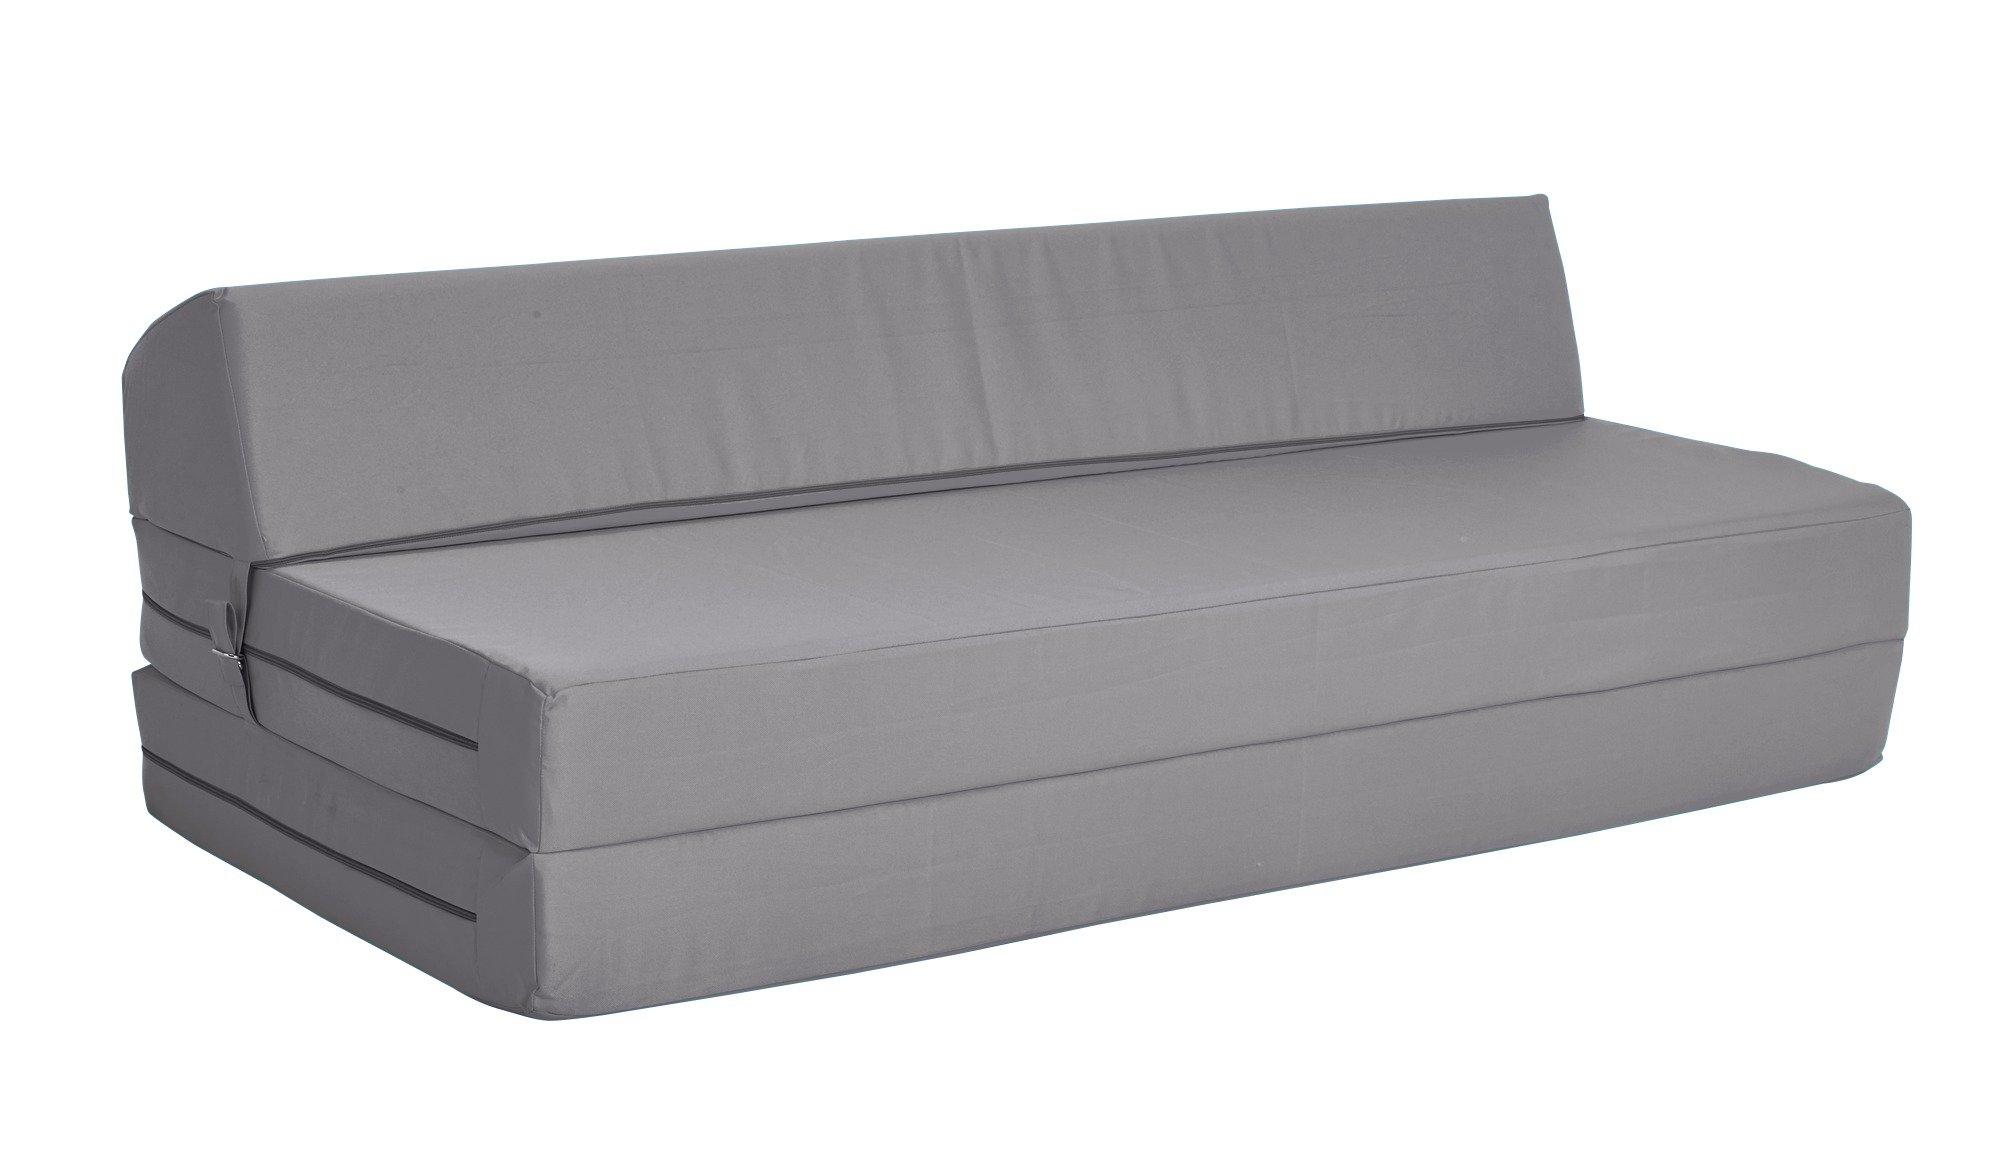 Argos Home Double Chairbed - Flint Grey